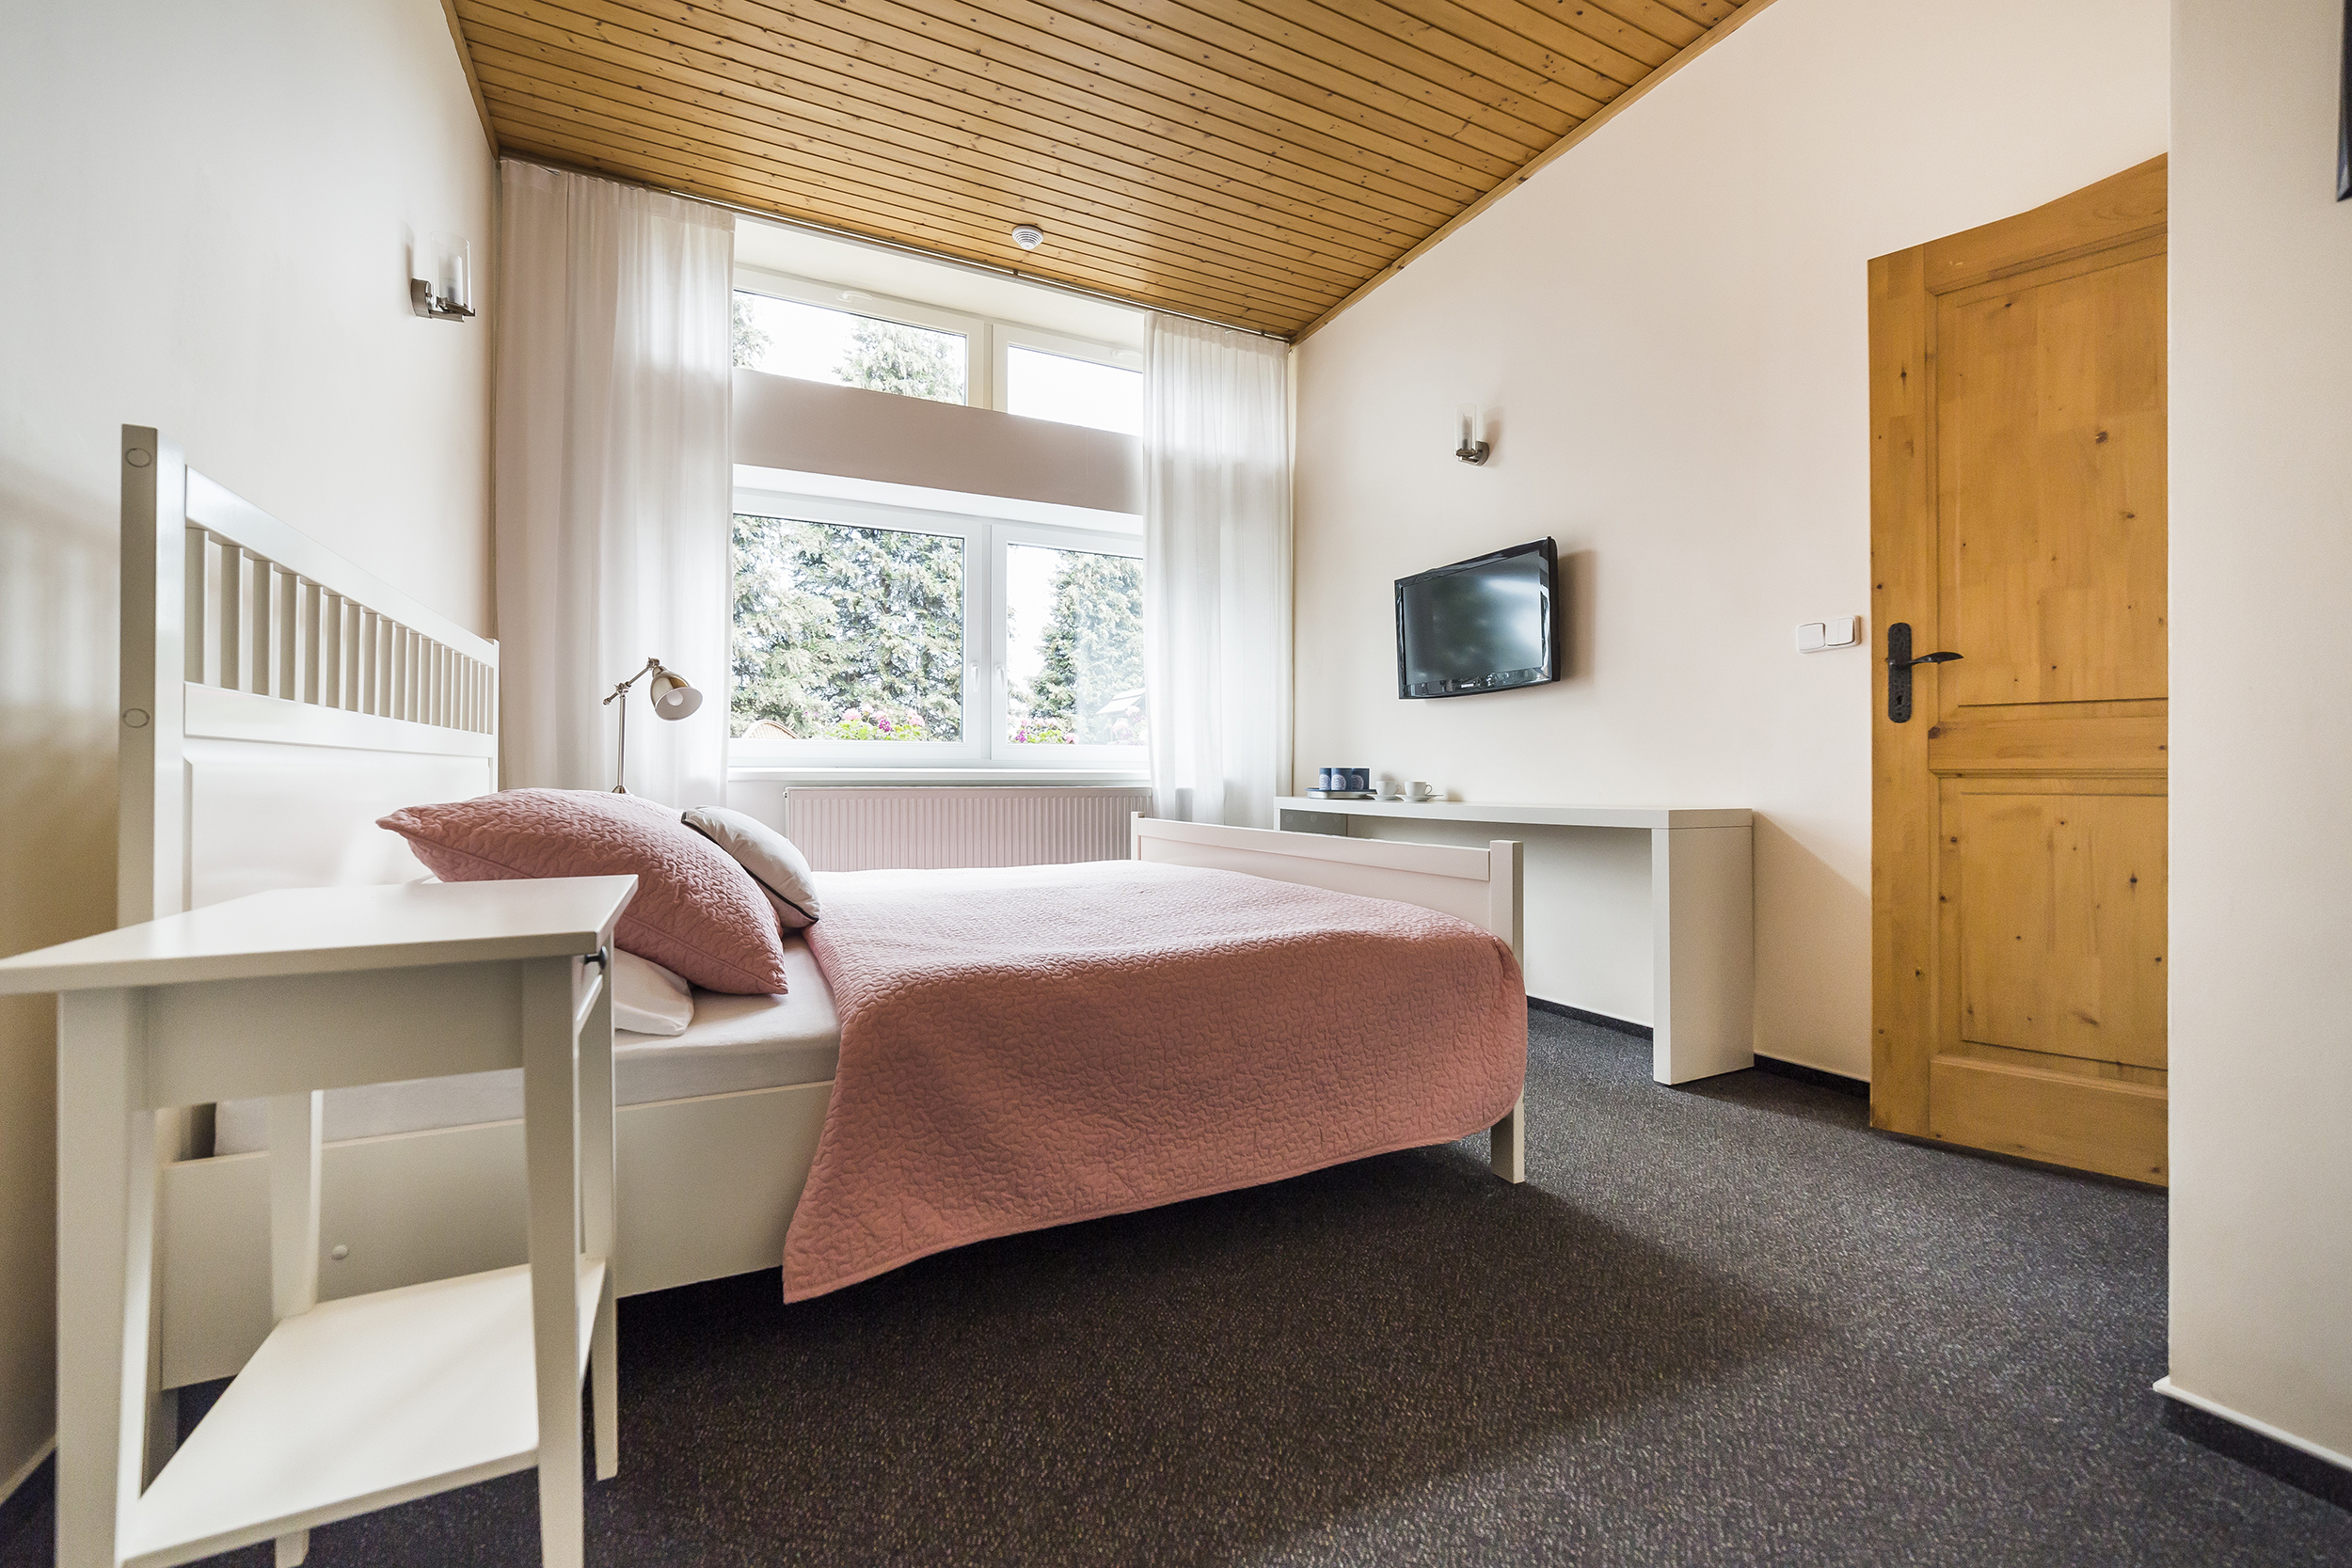 apartman postel televize dvere okno strop koberec prodej domu radun linda bittova